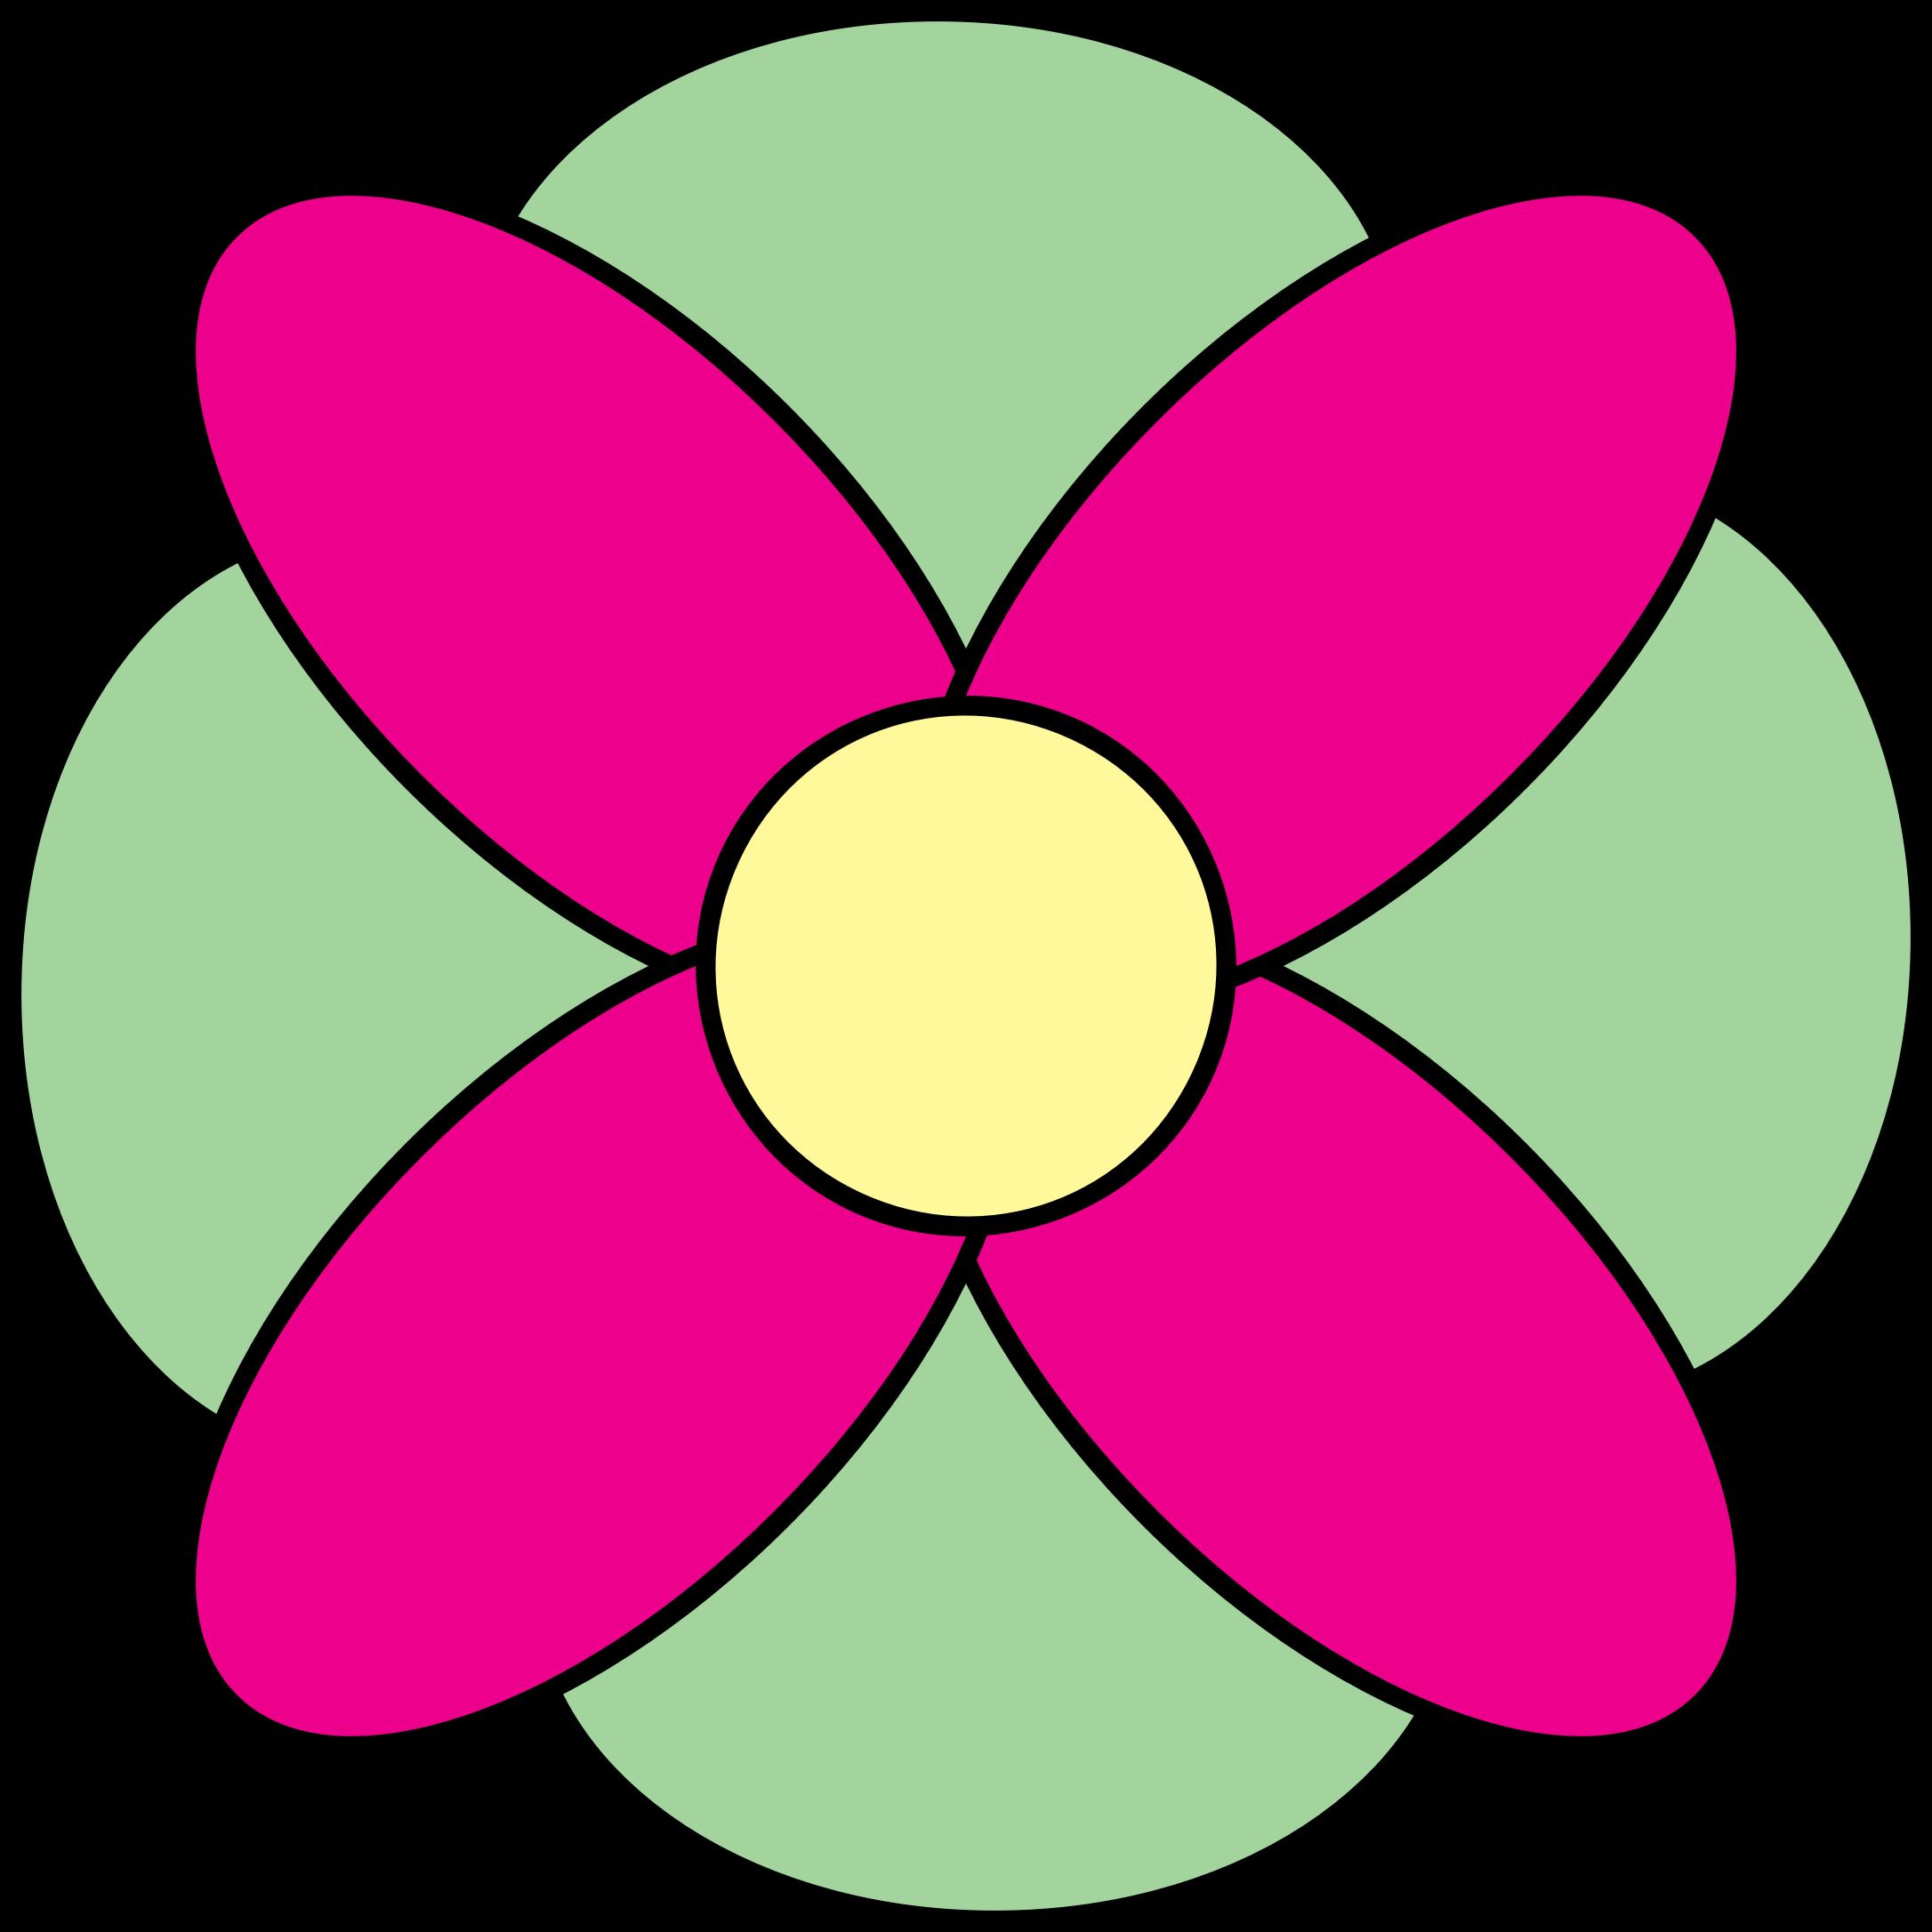 Petal clipart big flower IMAGE Clipart (PNG) Flower 4